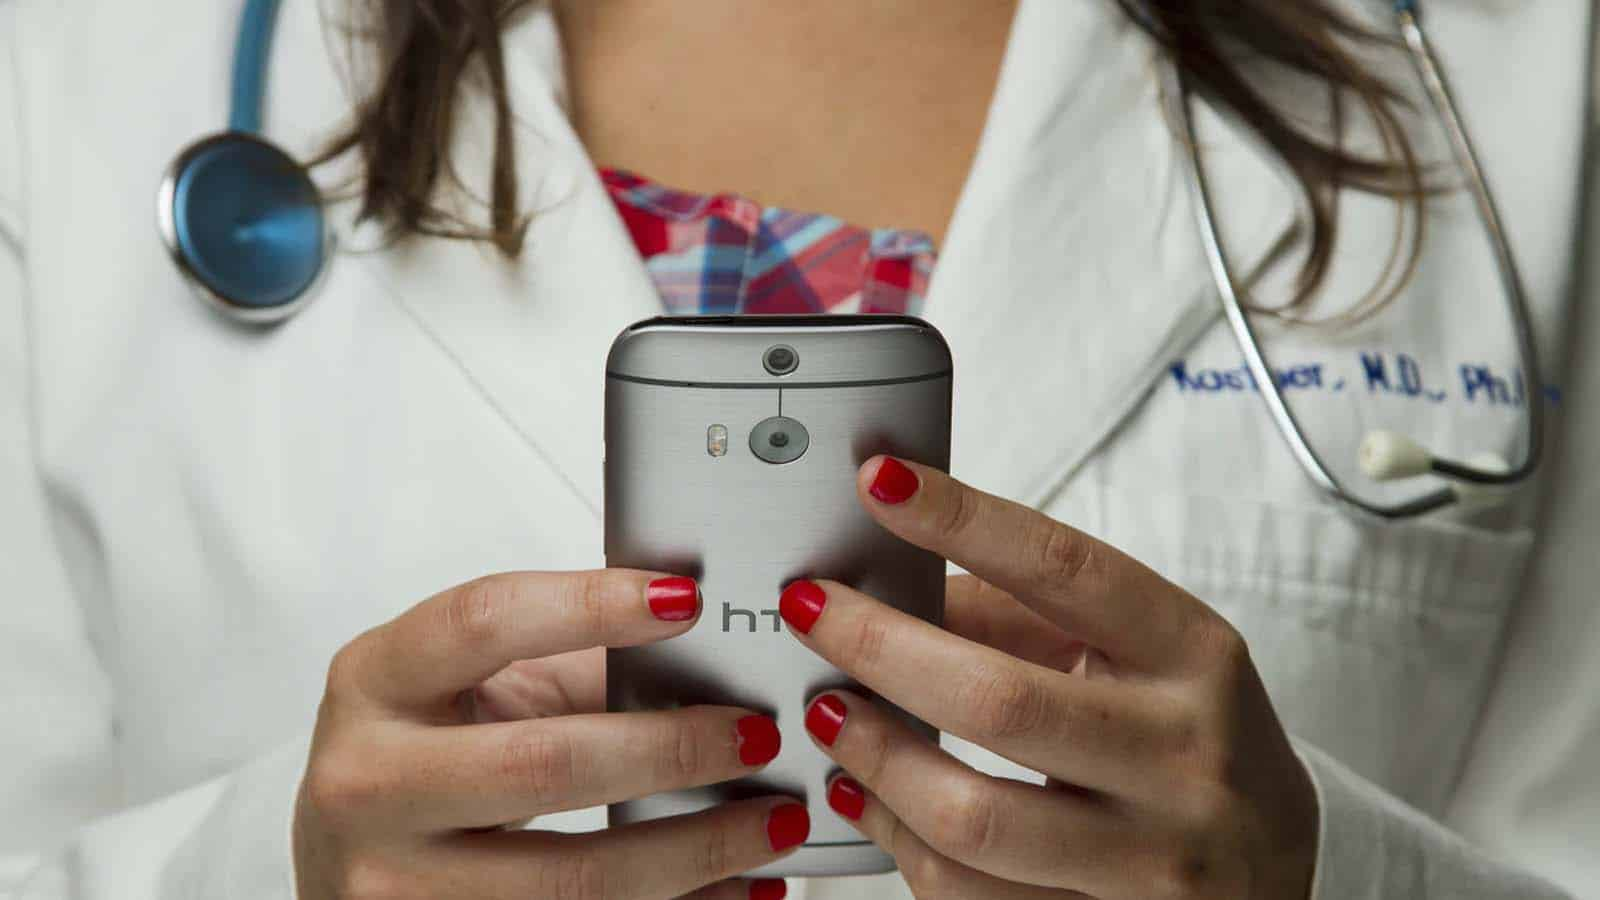 telemedicine on app